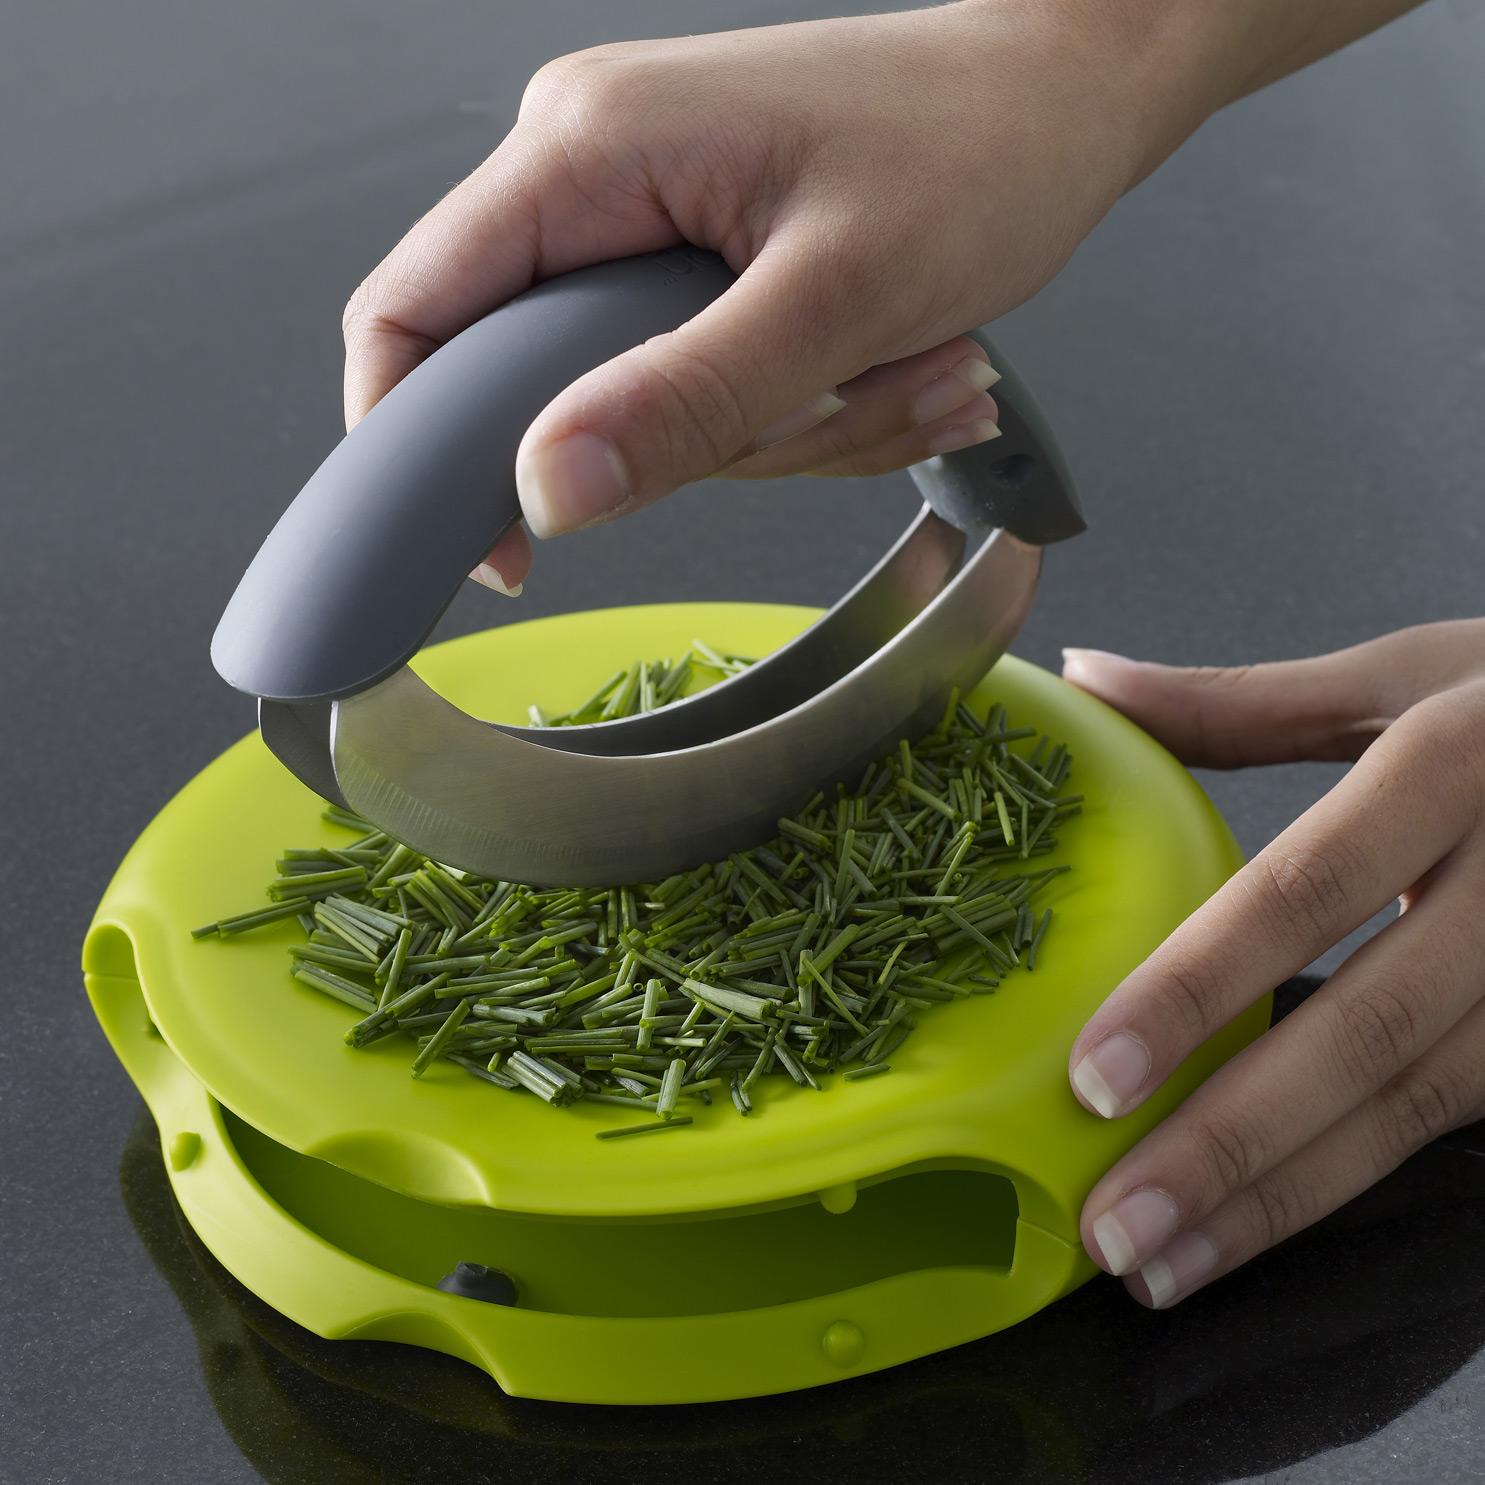 30 novedosos utensilios de cocina que todos deber amos tener for Utensilio para amasar